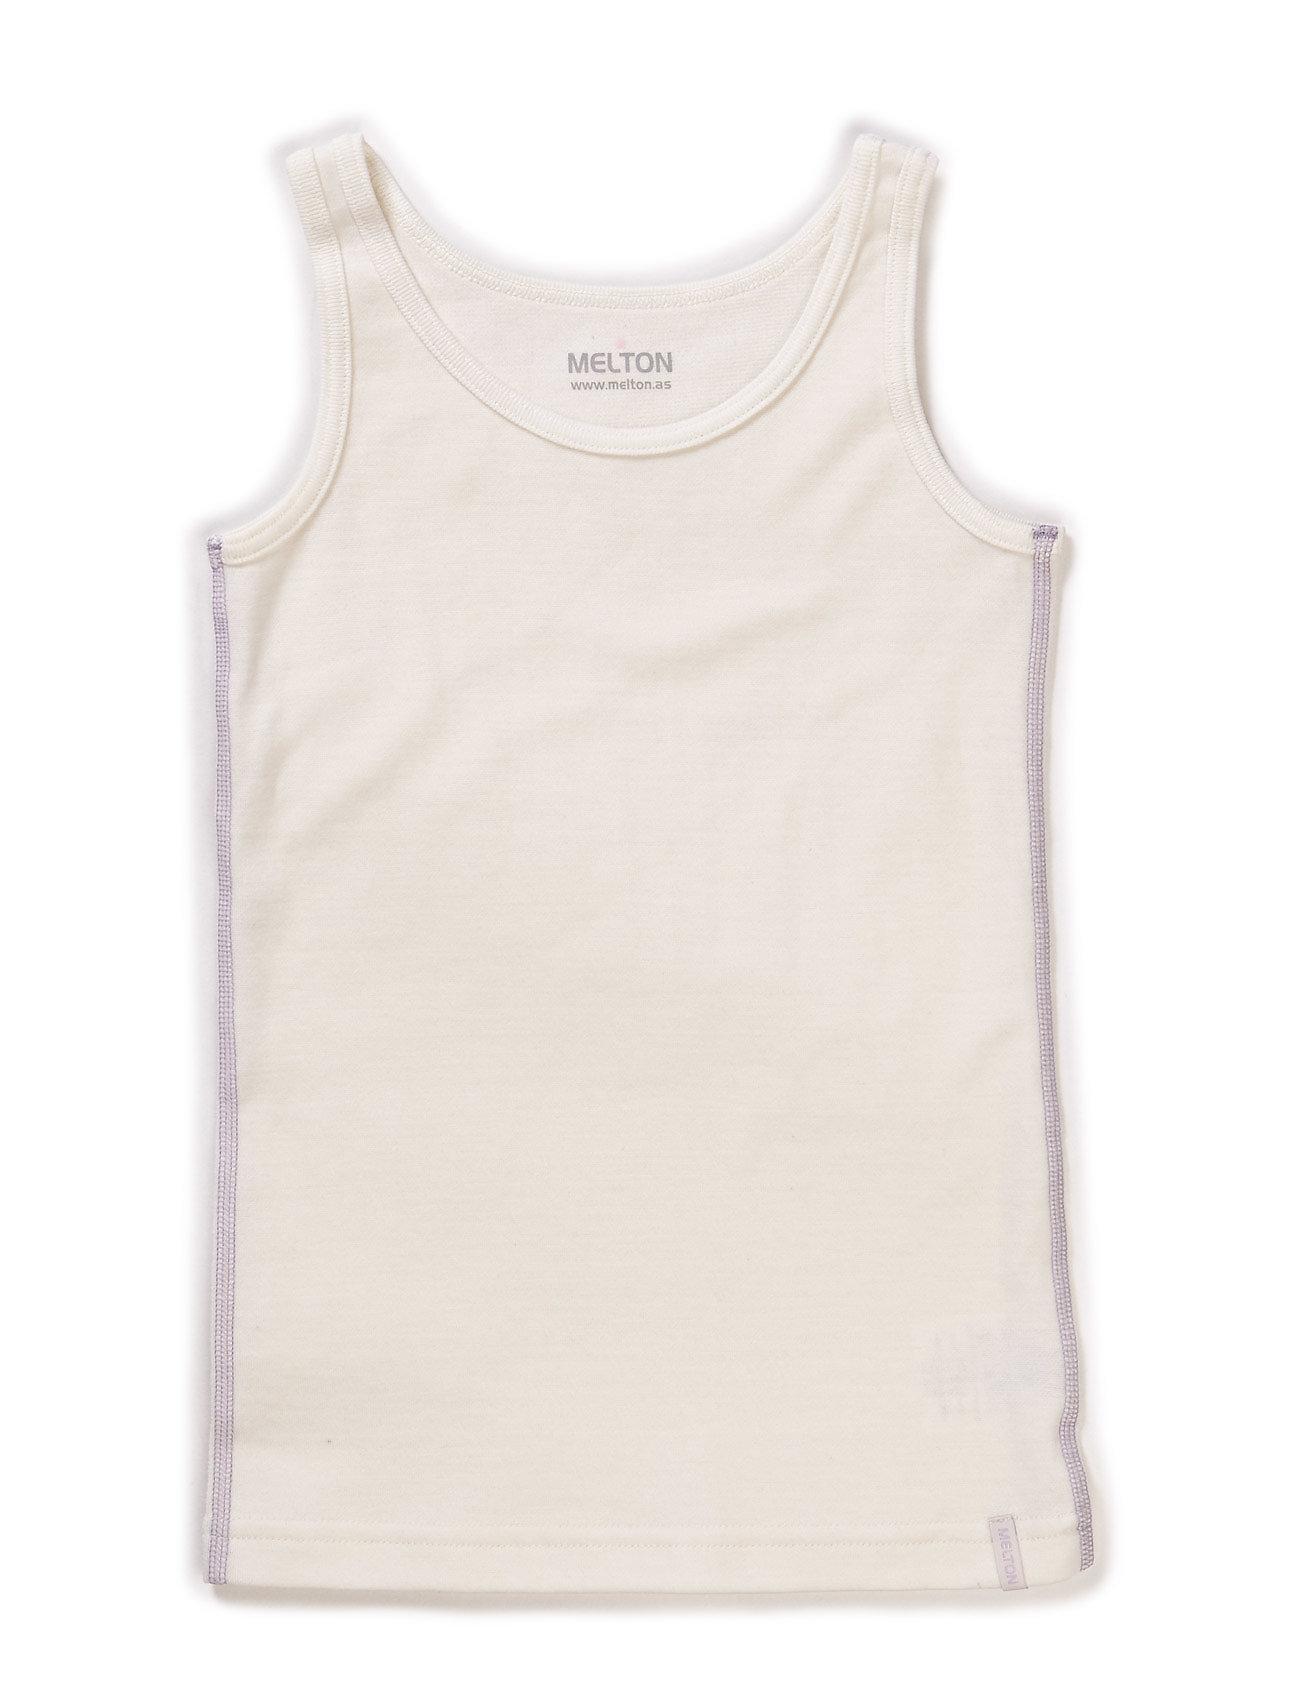 Melton Numbers 1pck - Girls Wool Top